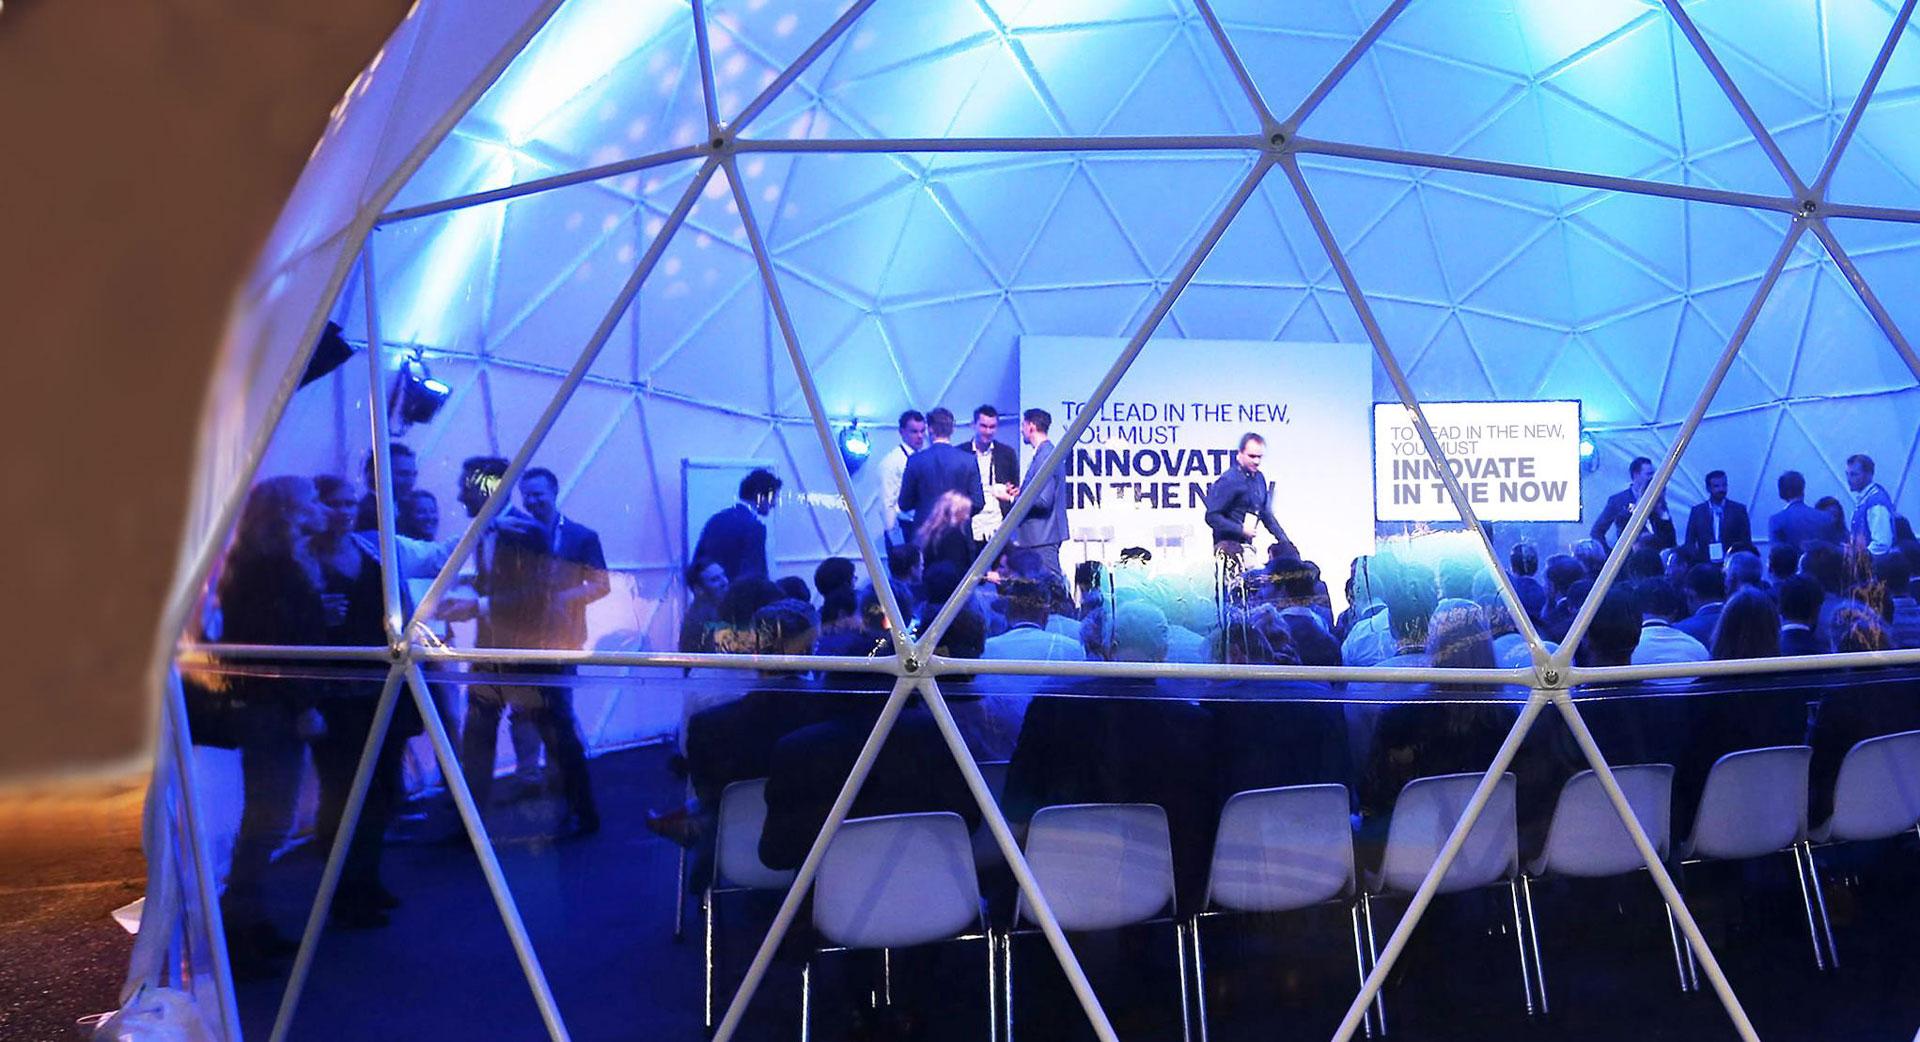 Innovation Bubble at 2017 Accenture Innovation Summit